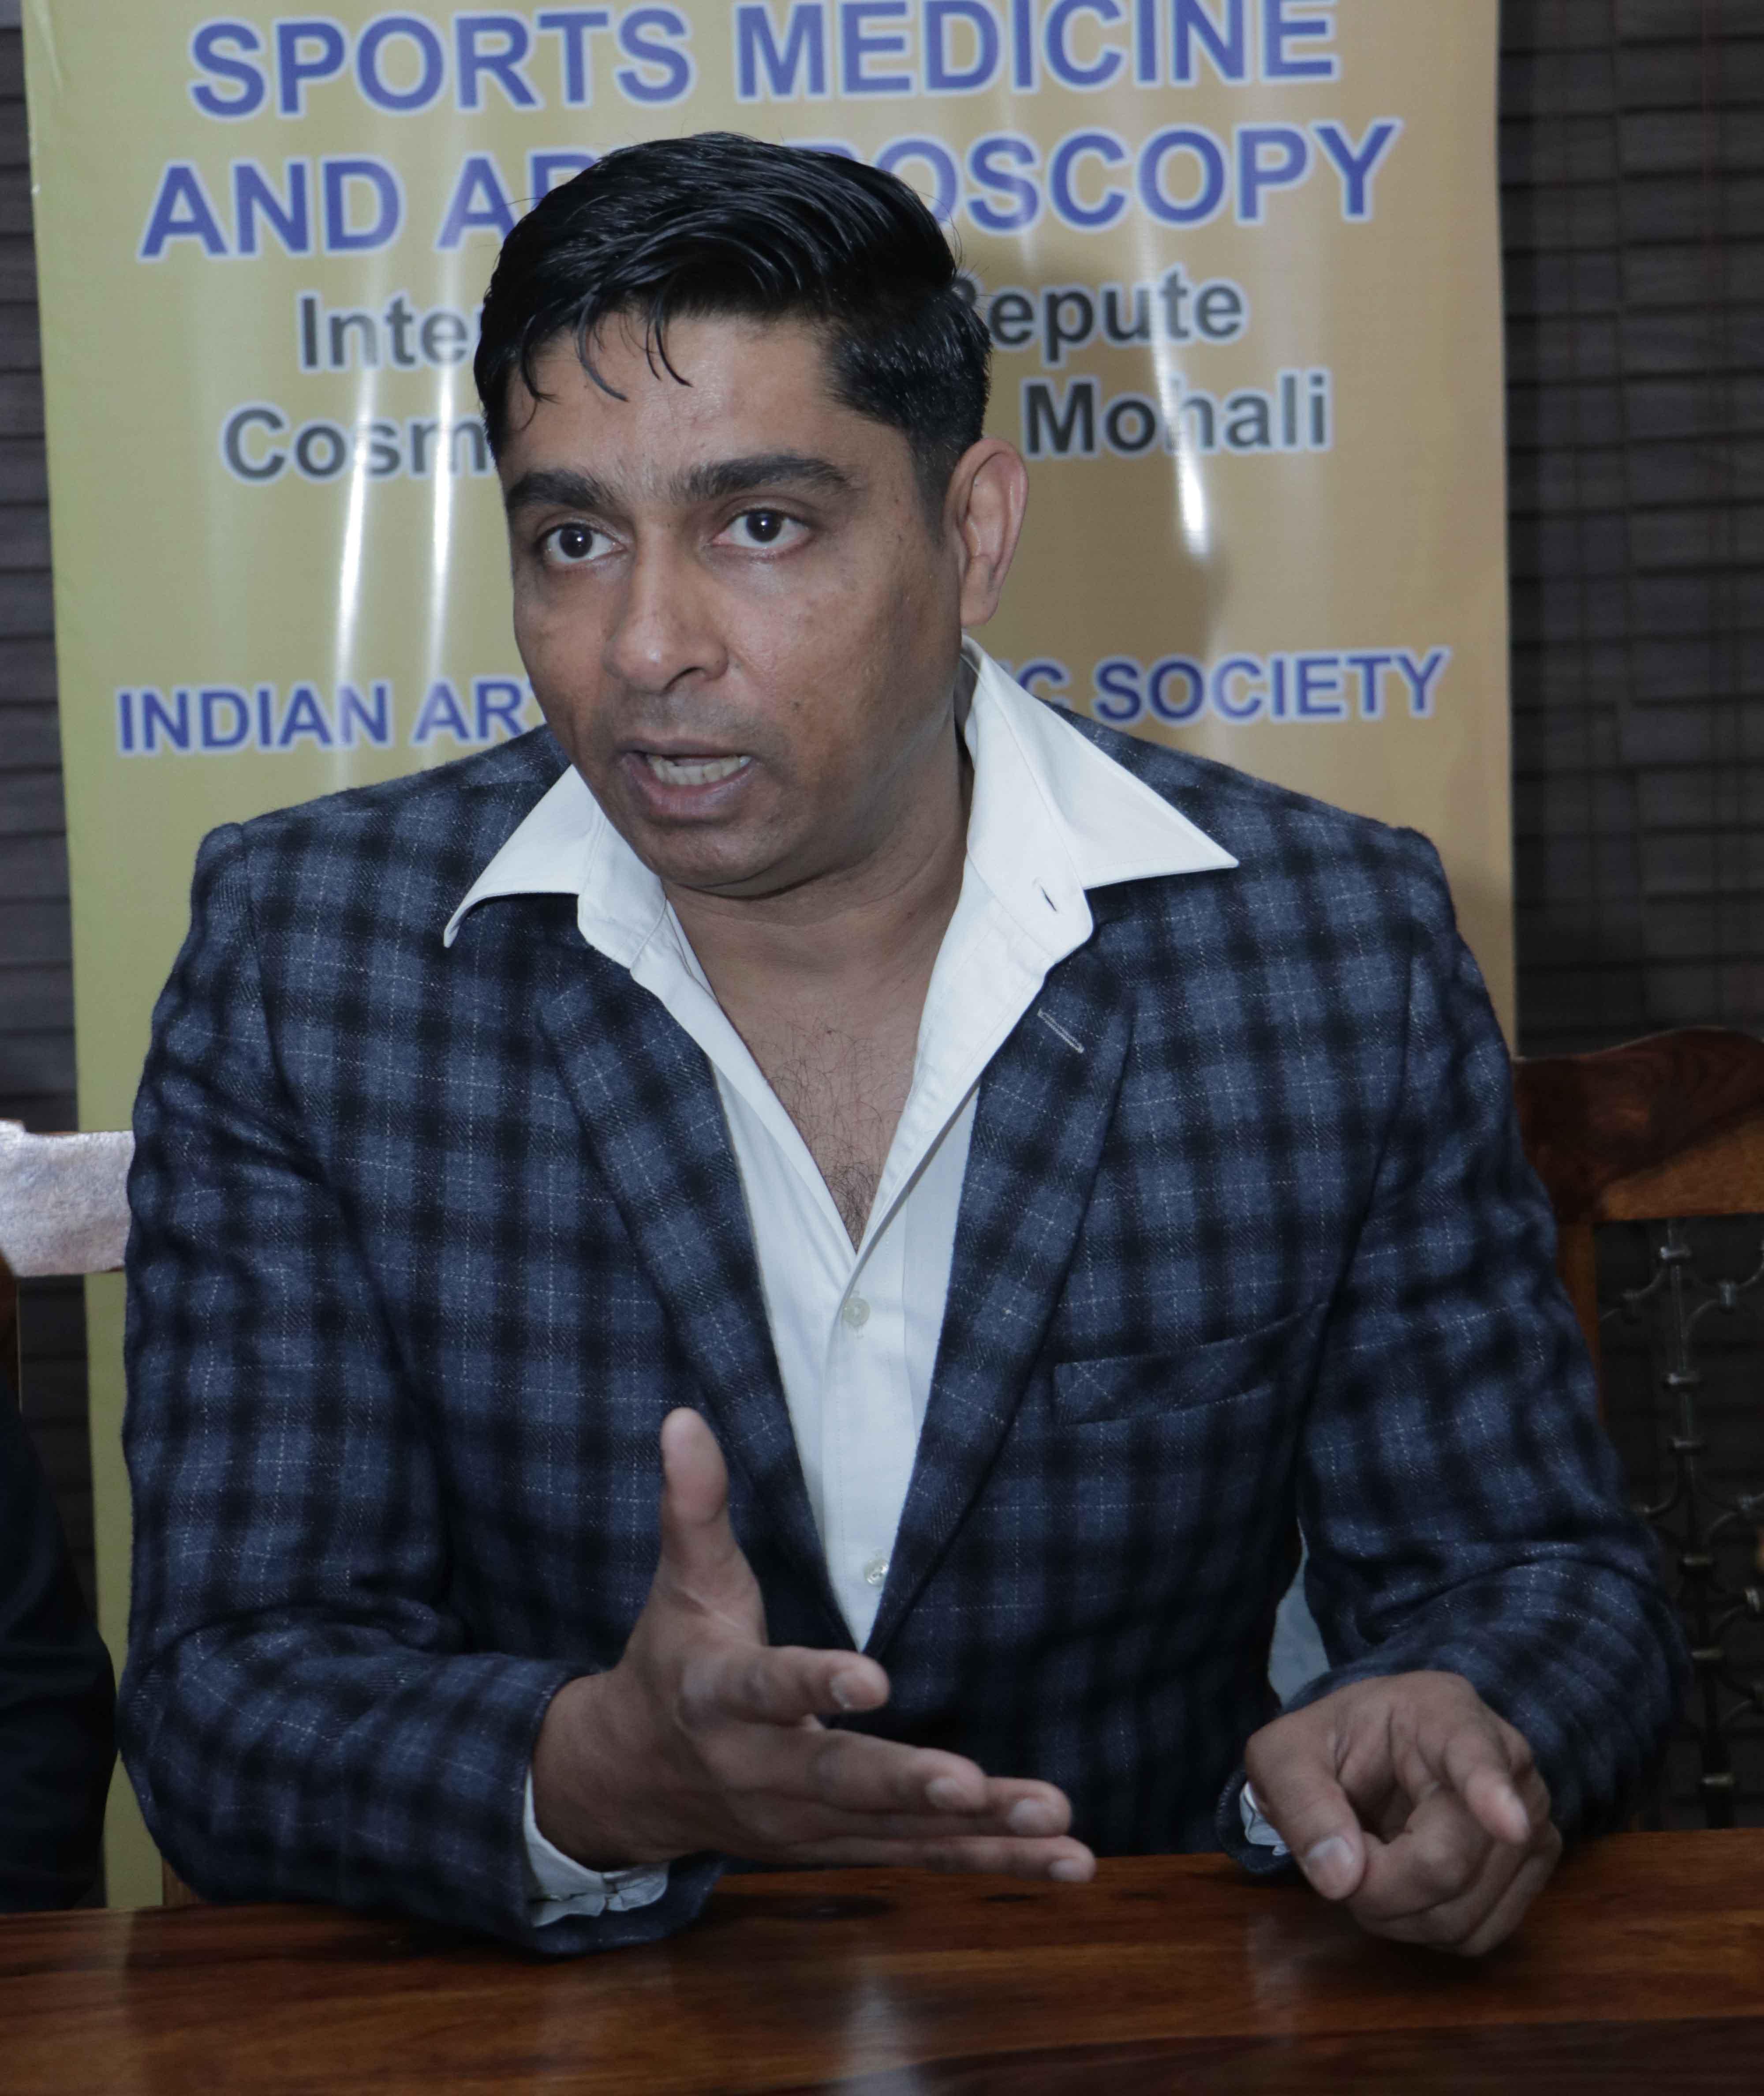 Dr. Satbir singh: Sports medicine specialist, arthrscopy and spinal endoscopy consultant